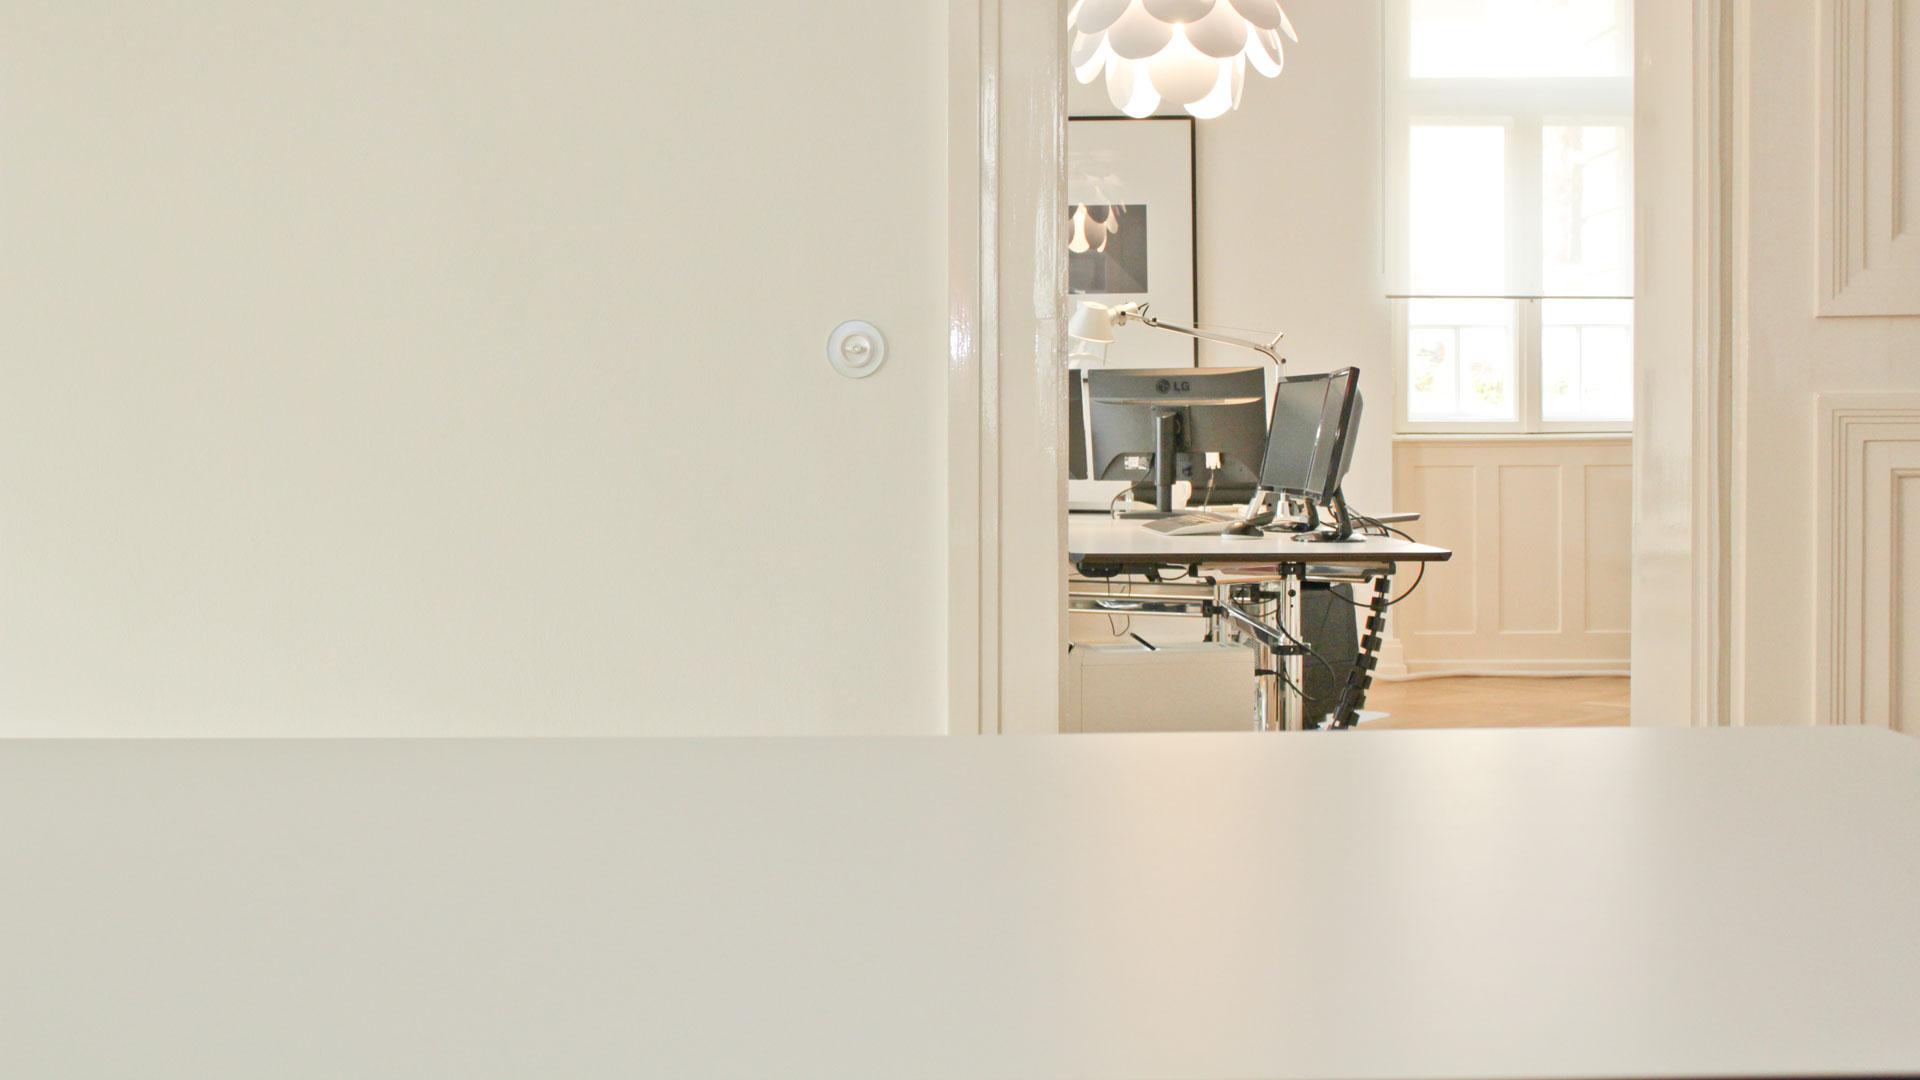 Responsive Webdesign Background